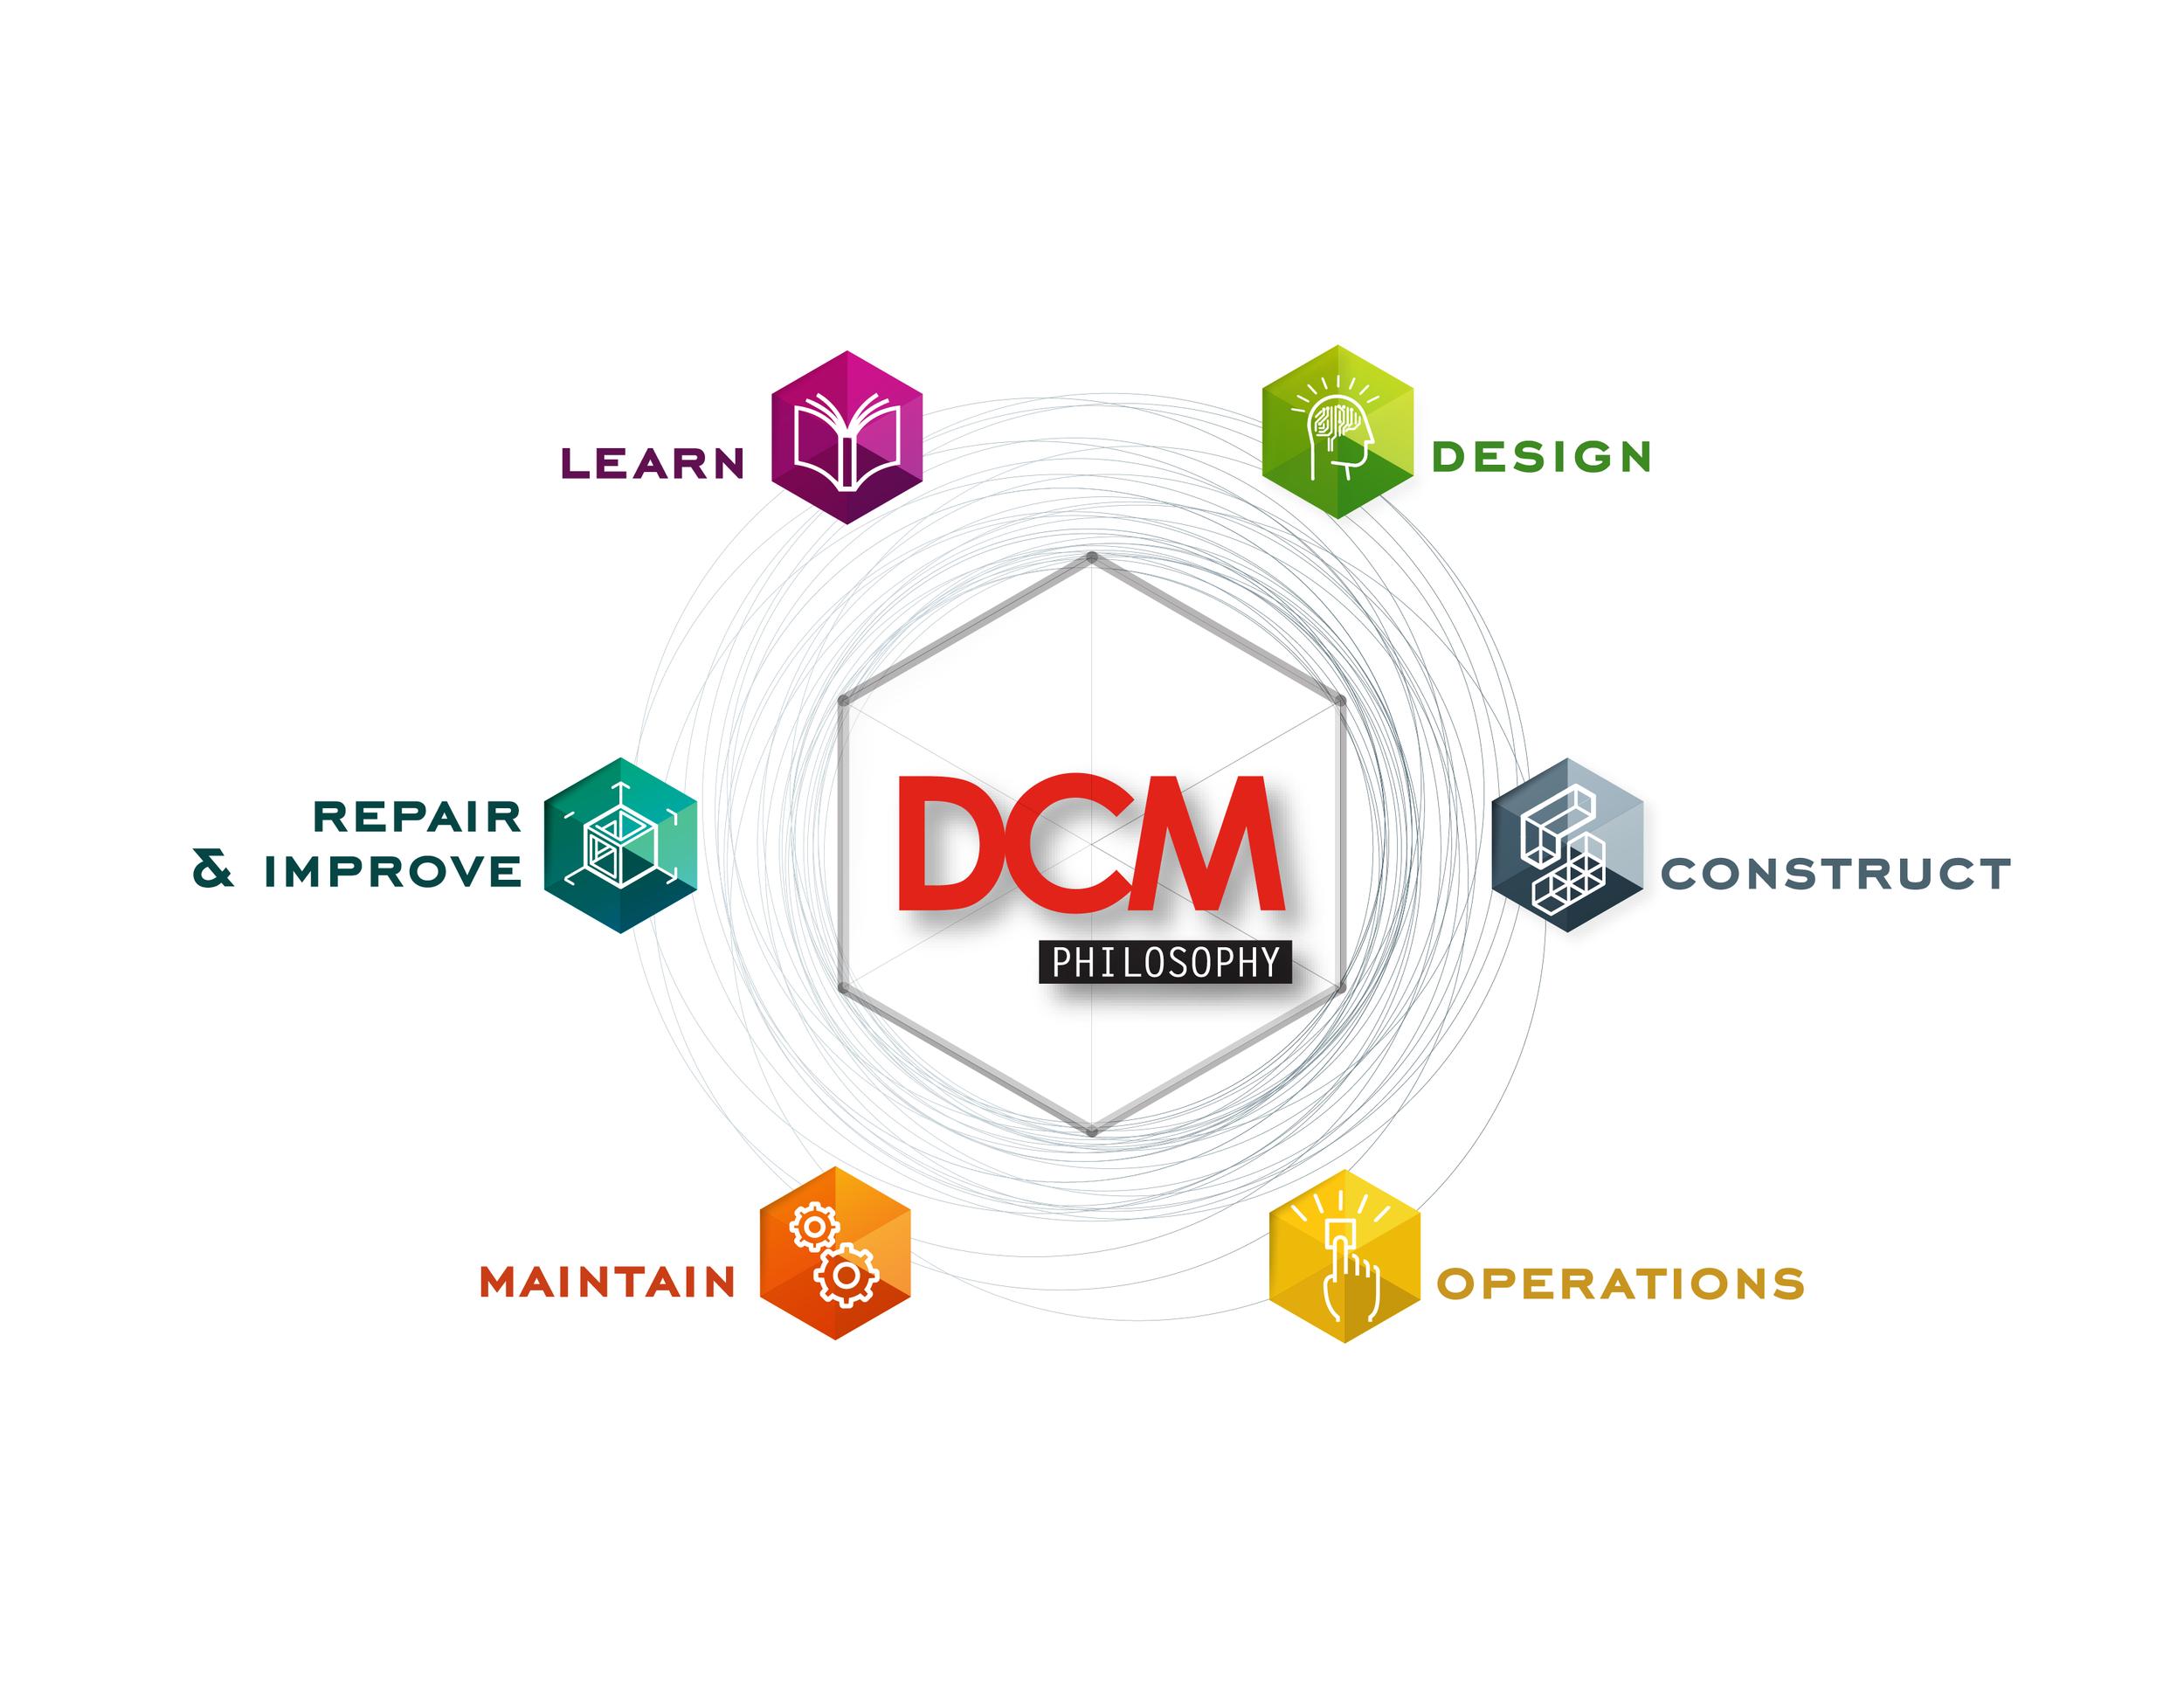 DCM-phi-system.png